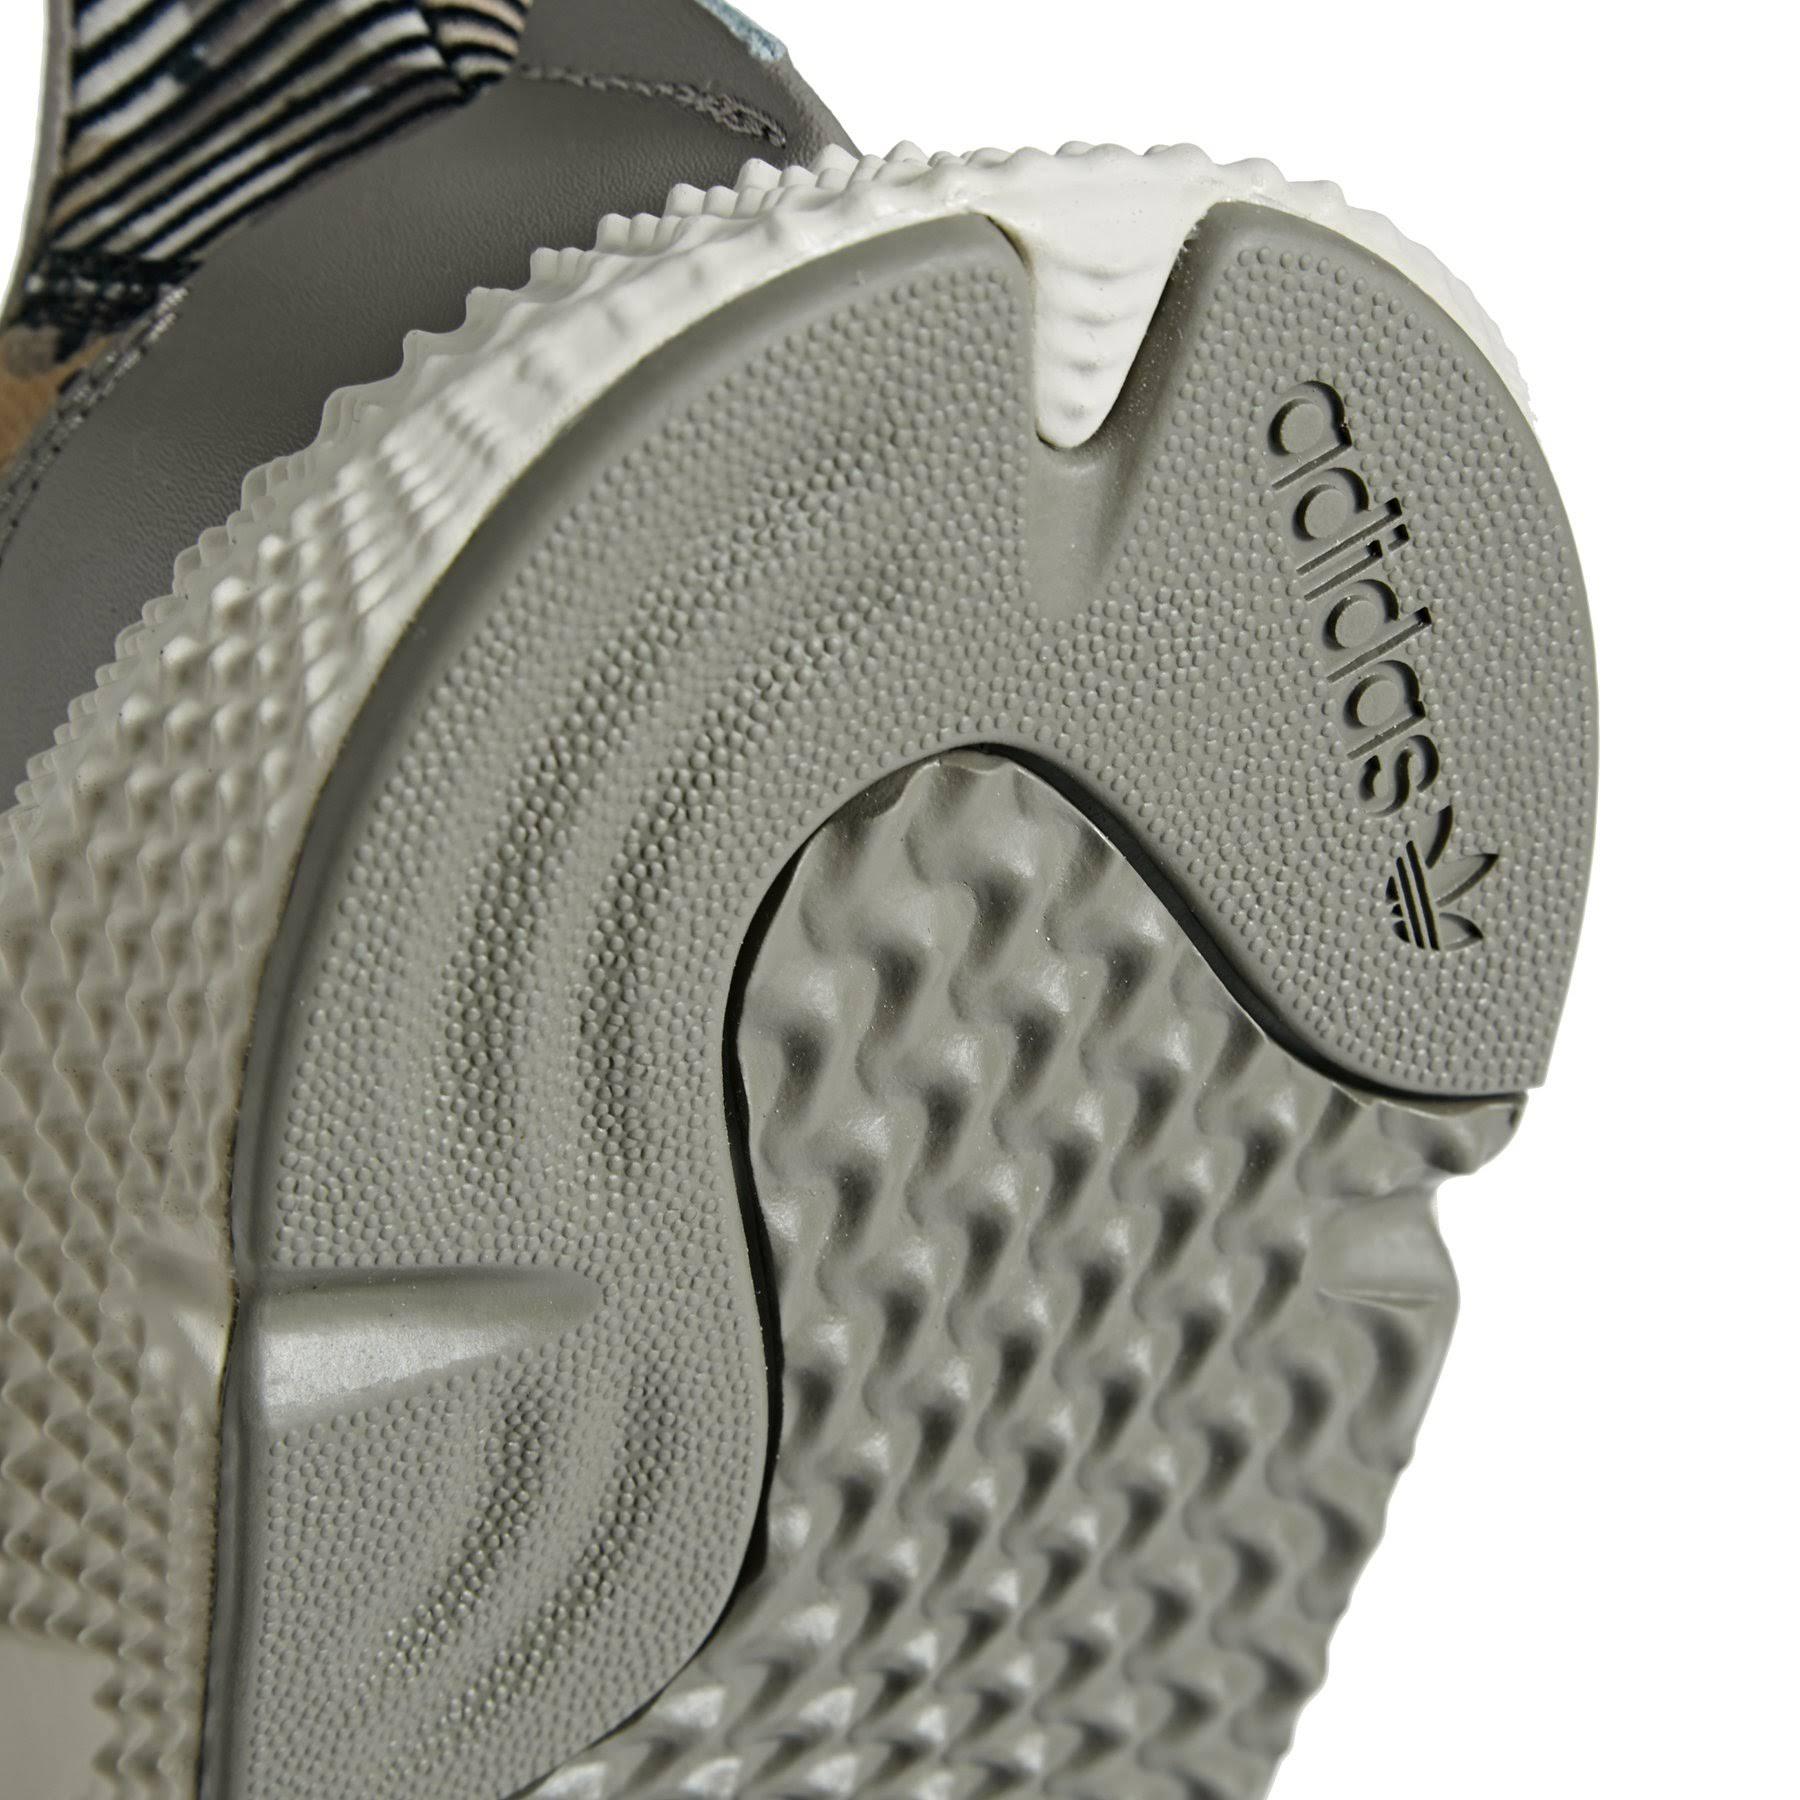 Originals Prophere Adidas SchoenenBruin Zwart Yyb6fv7g